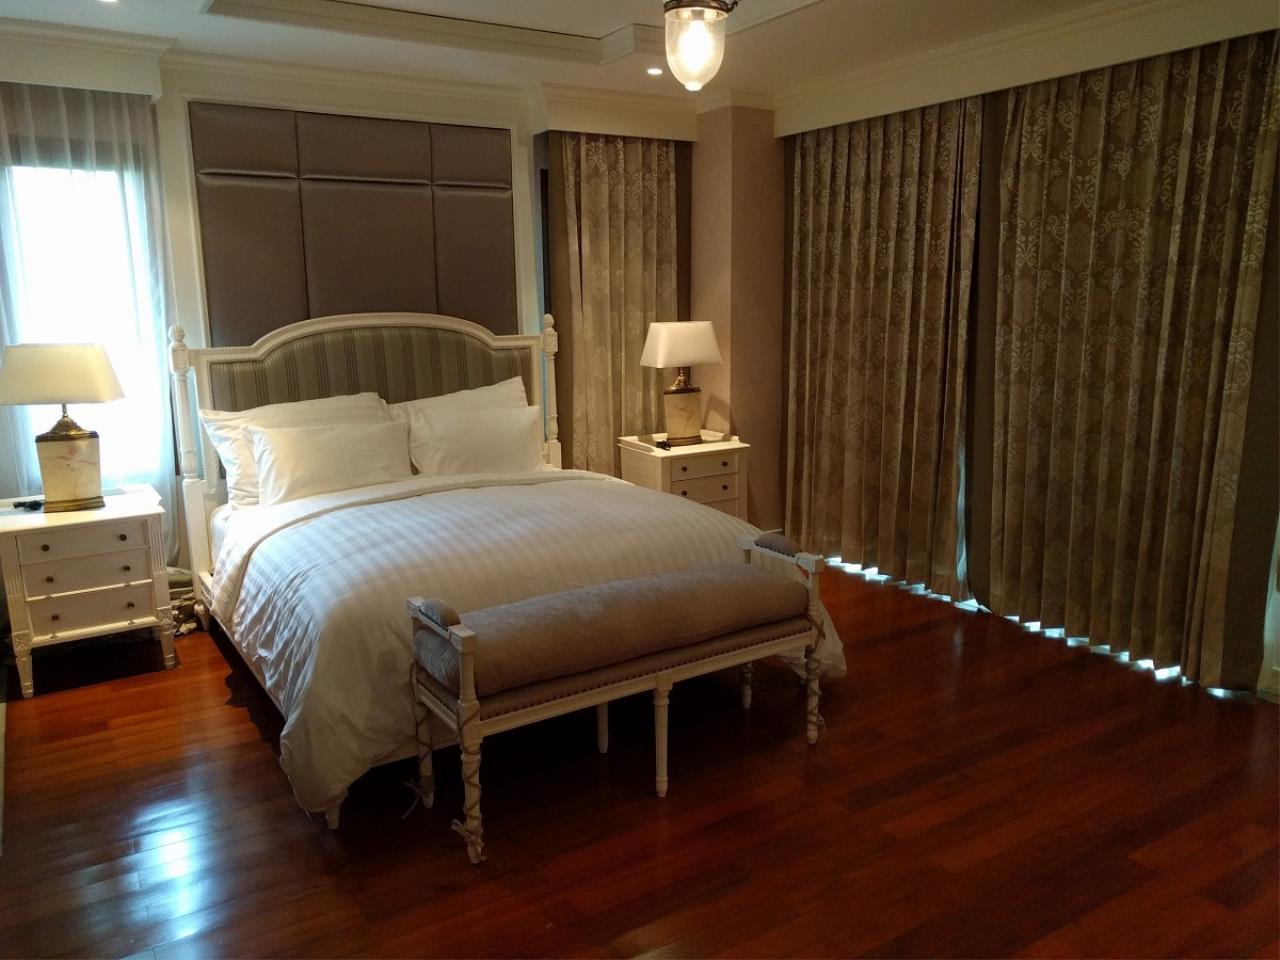 RE/MAX CondoDee Agency's Thai Elegance Luxury Condominium - Entire Building for Sale 14